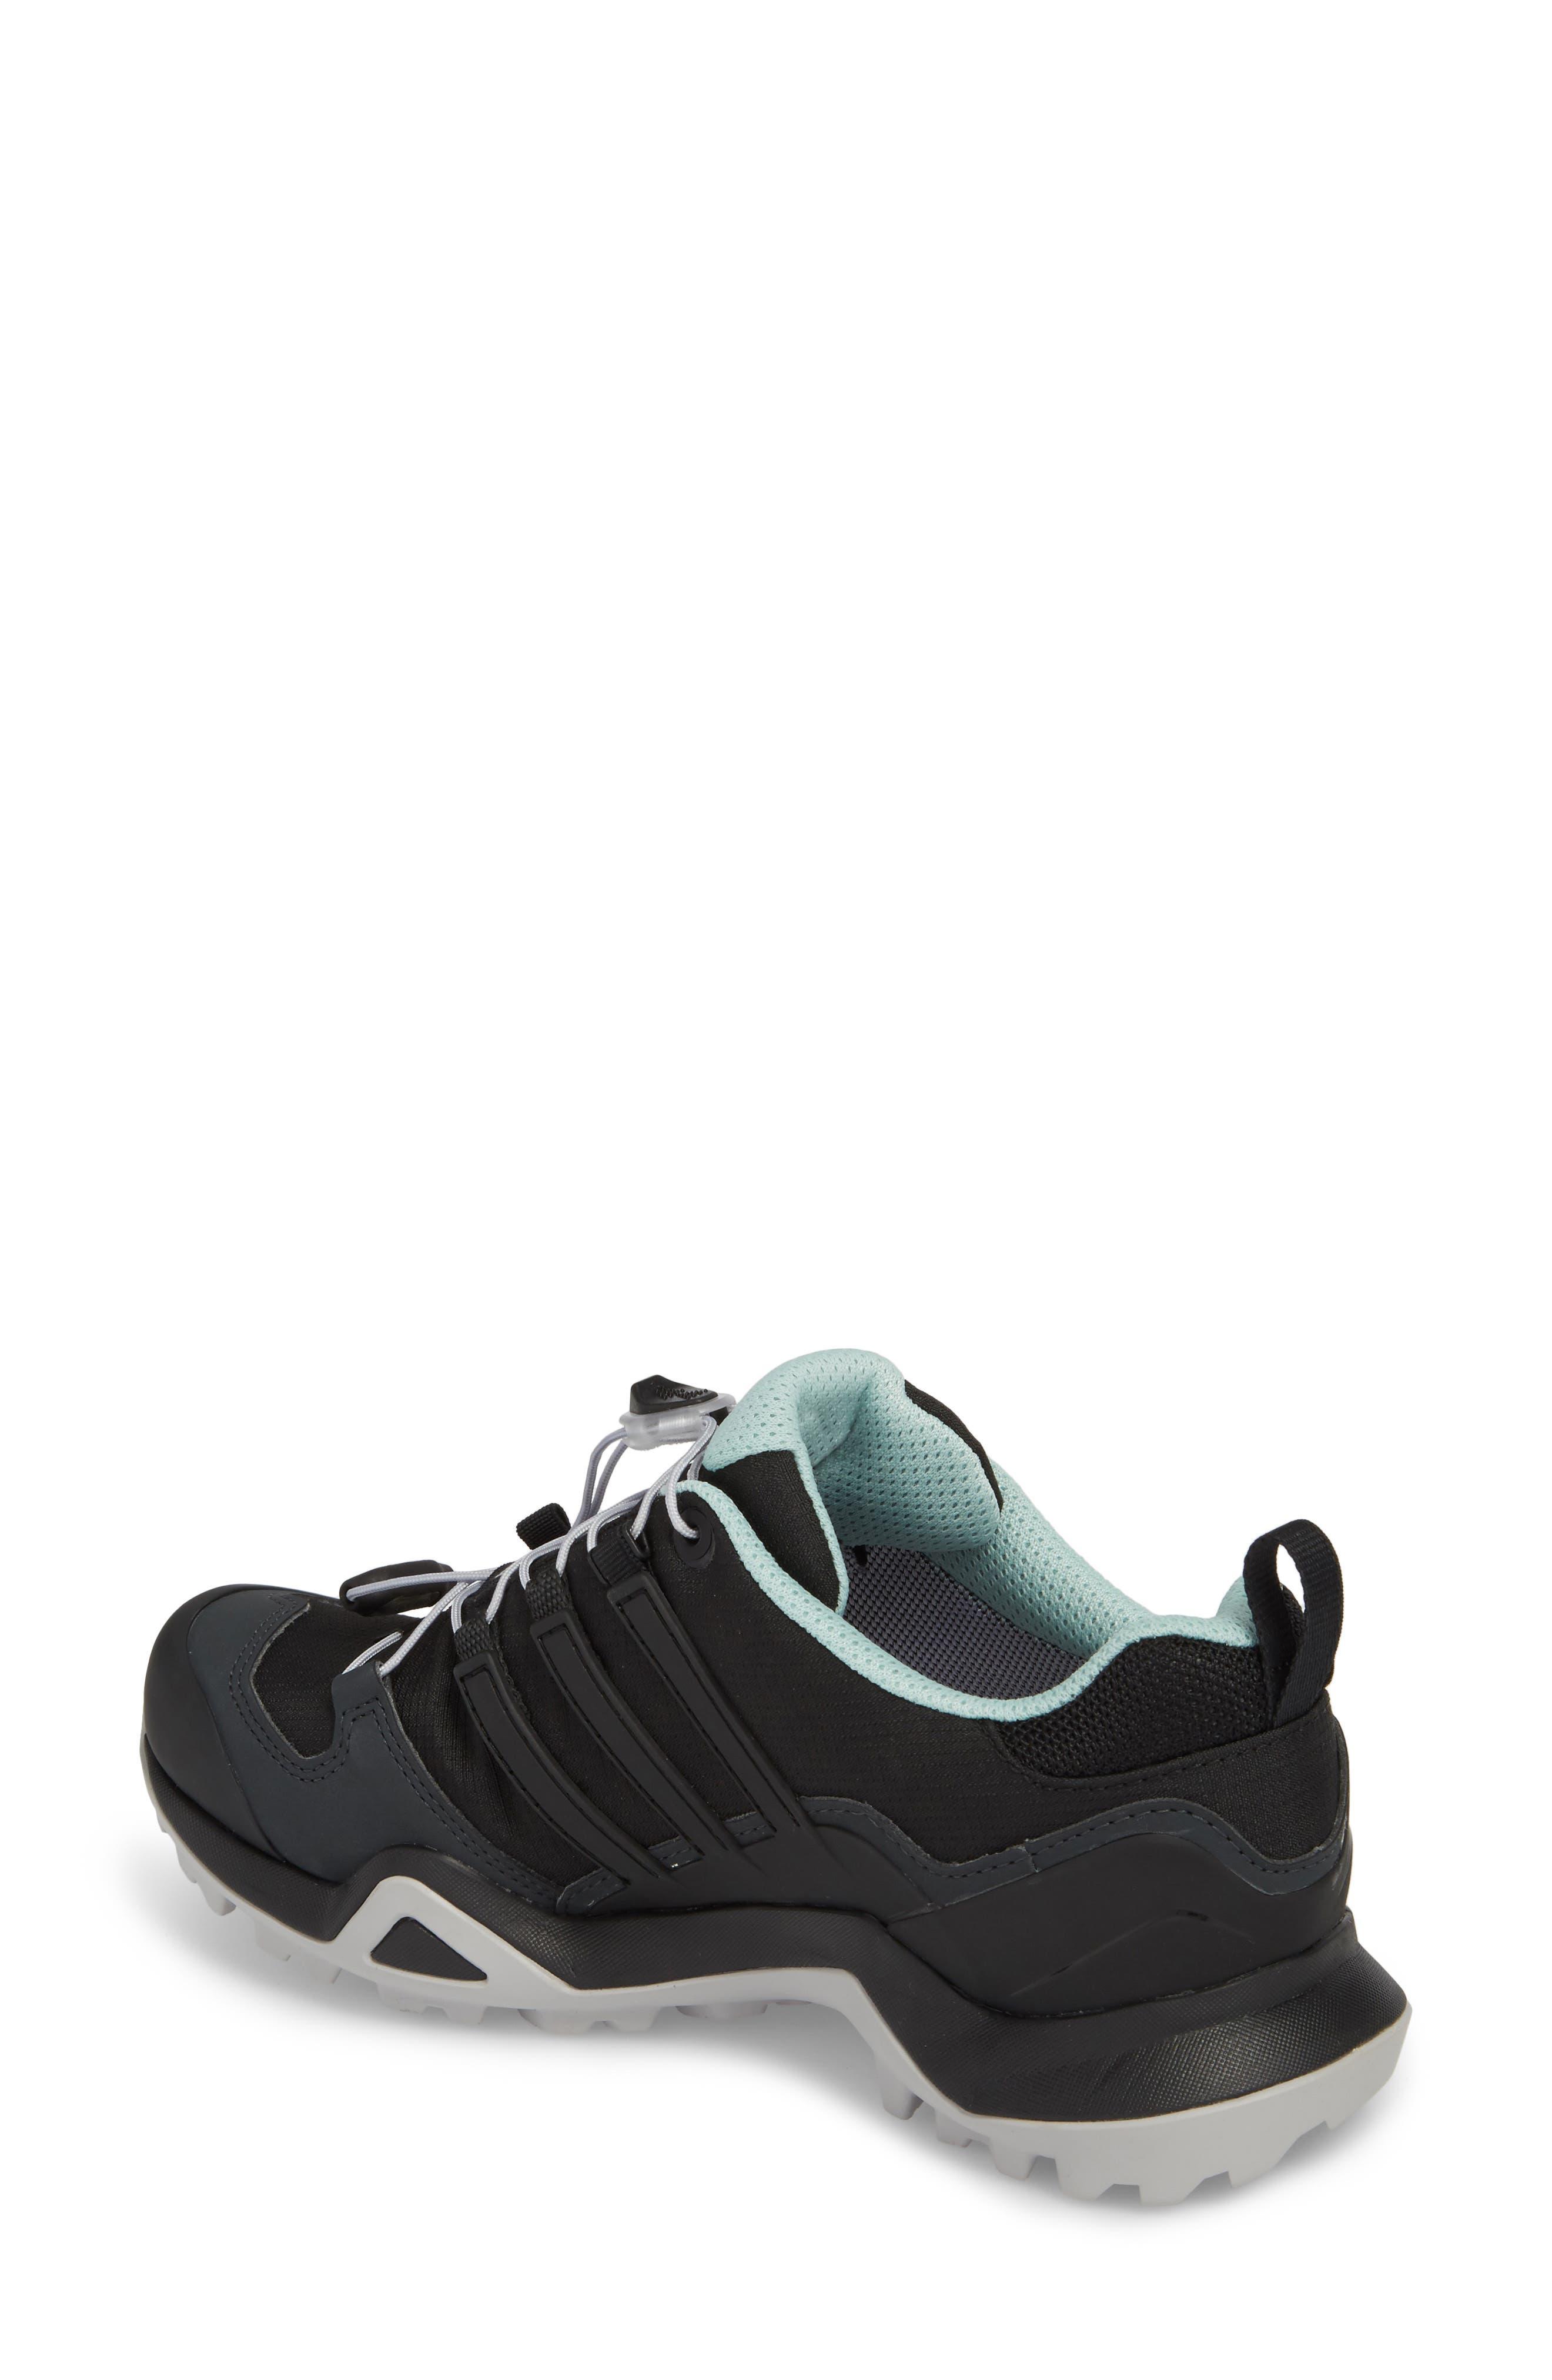 Terrex Swift R2 Gore-Tex<sup>®</sup> Hiking Shoe,                             Alternate thumbnail 2, color,                             Black/ Black/ Ash Green